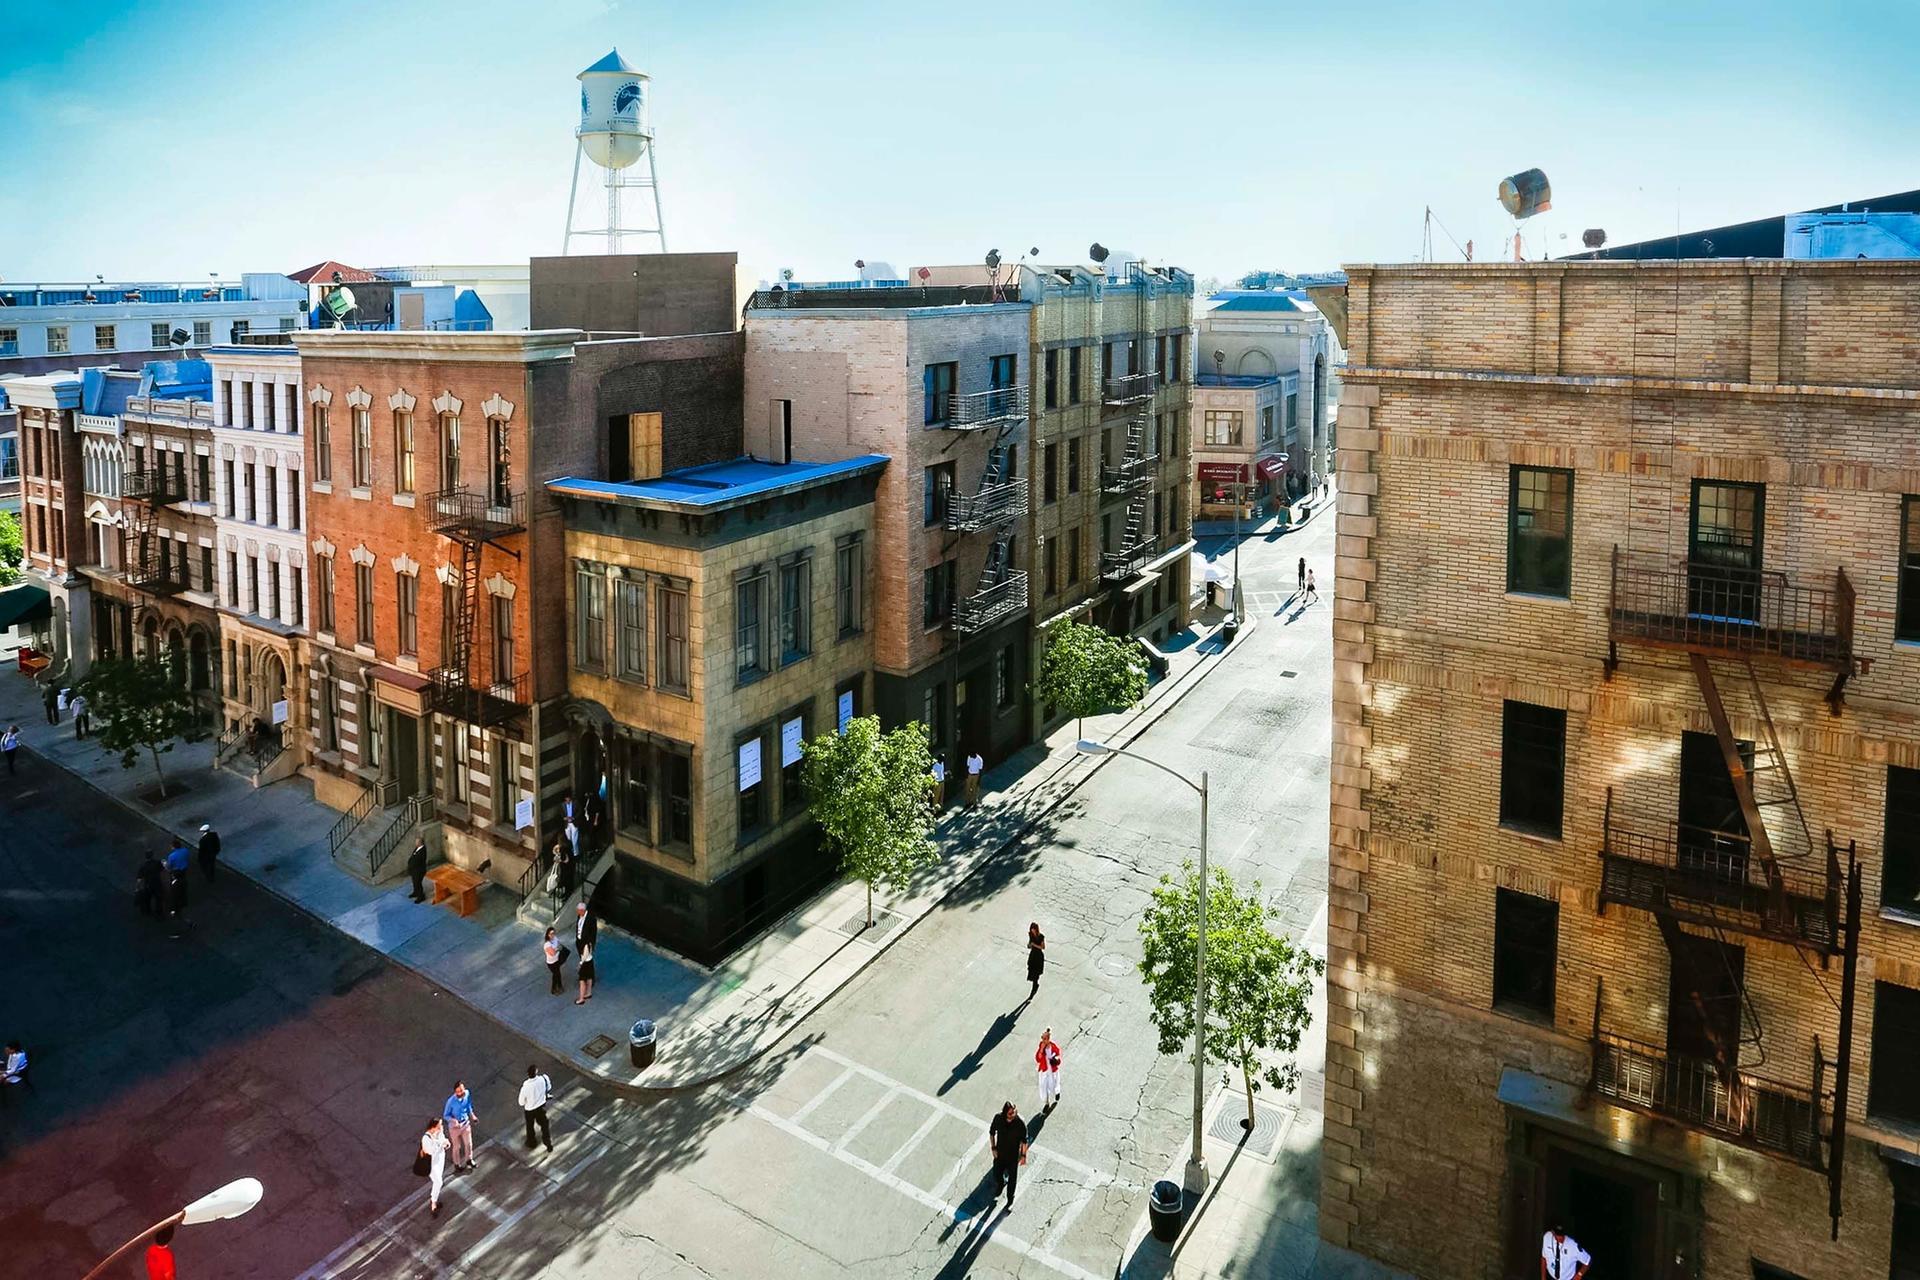 The New York city backlot at Paramount Pictures Studios in Los Angeles © Paramount Pictures Studios